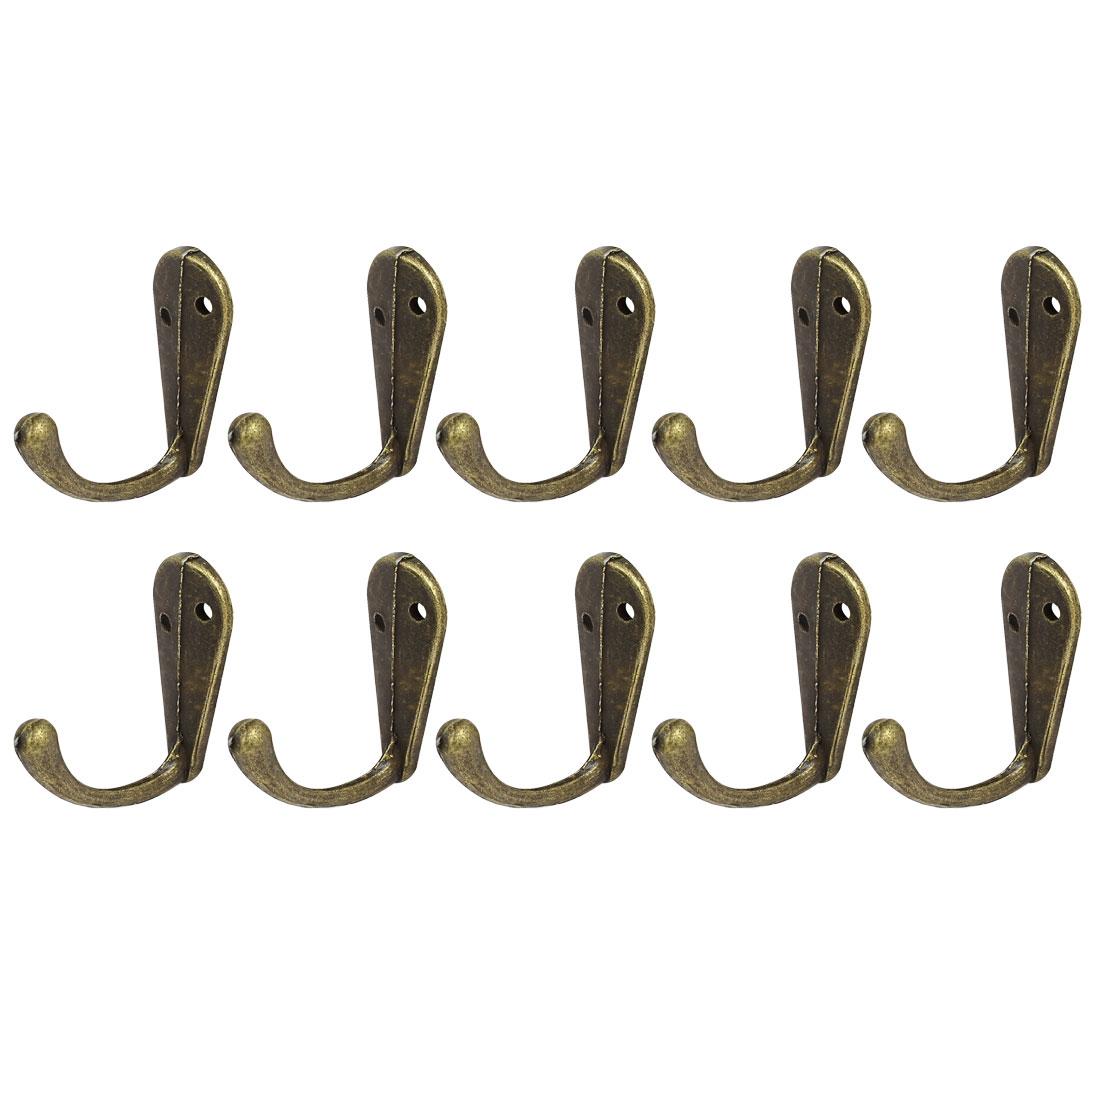 35mmx13mmx30mm Vintage Style Wall Mounted Single Hook Hanger Bronze Tone 10pcs